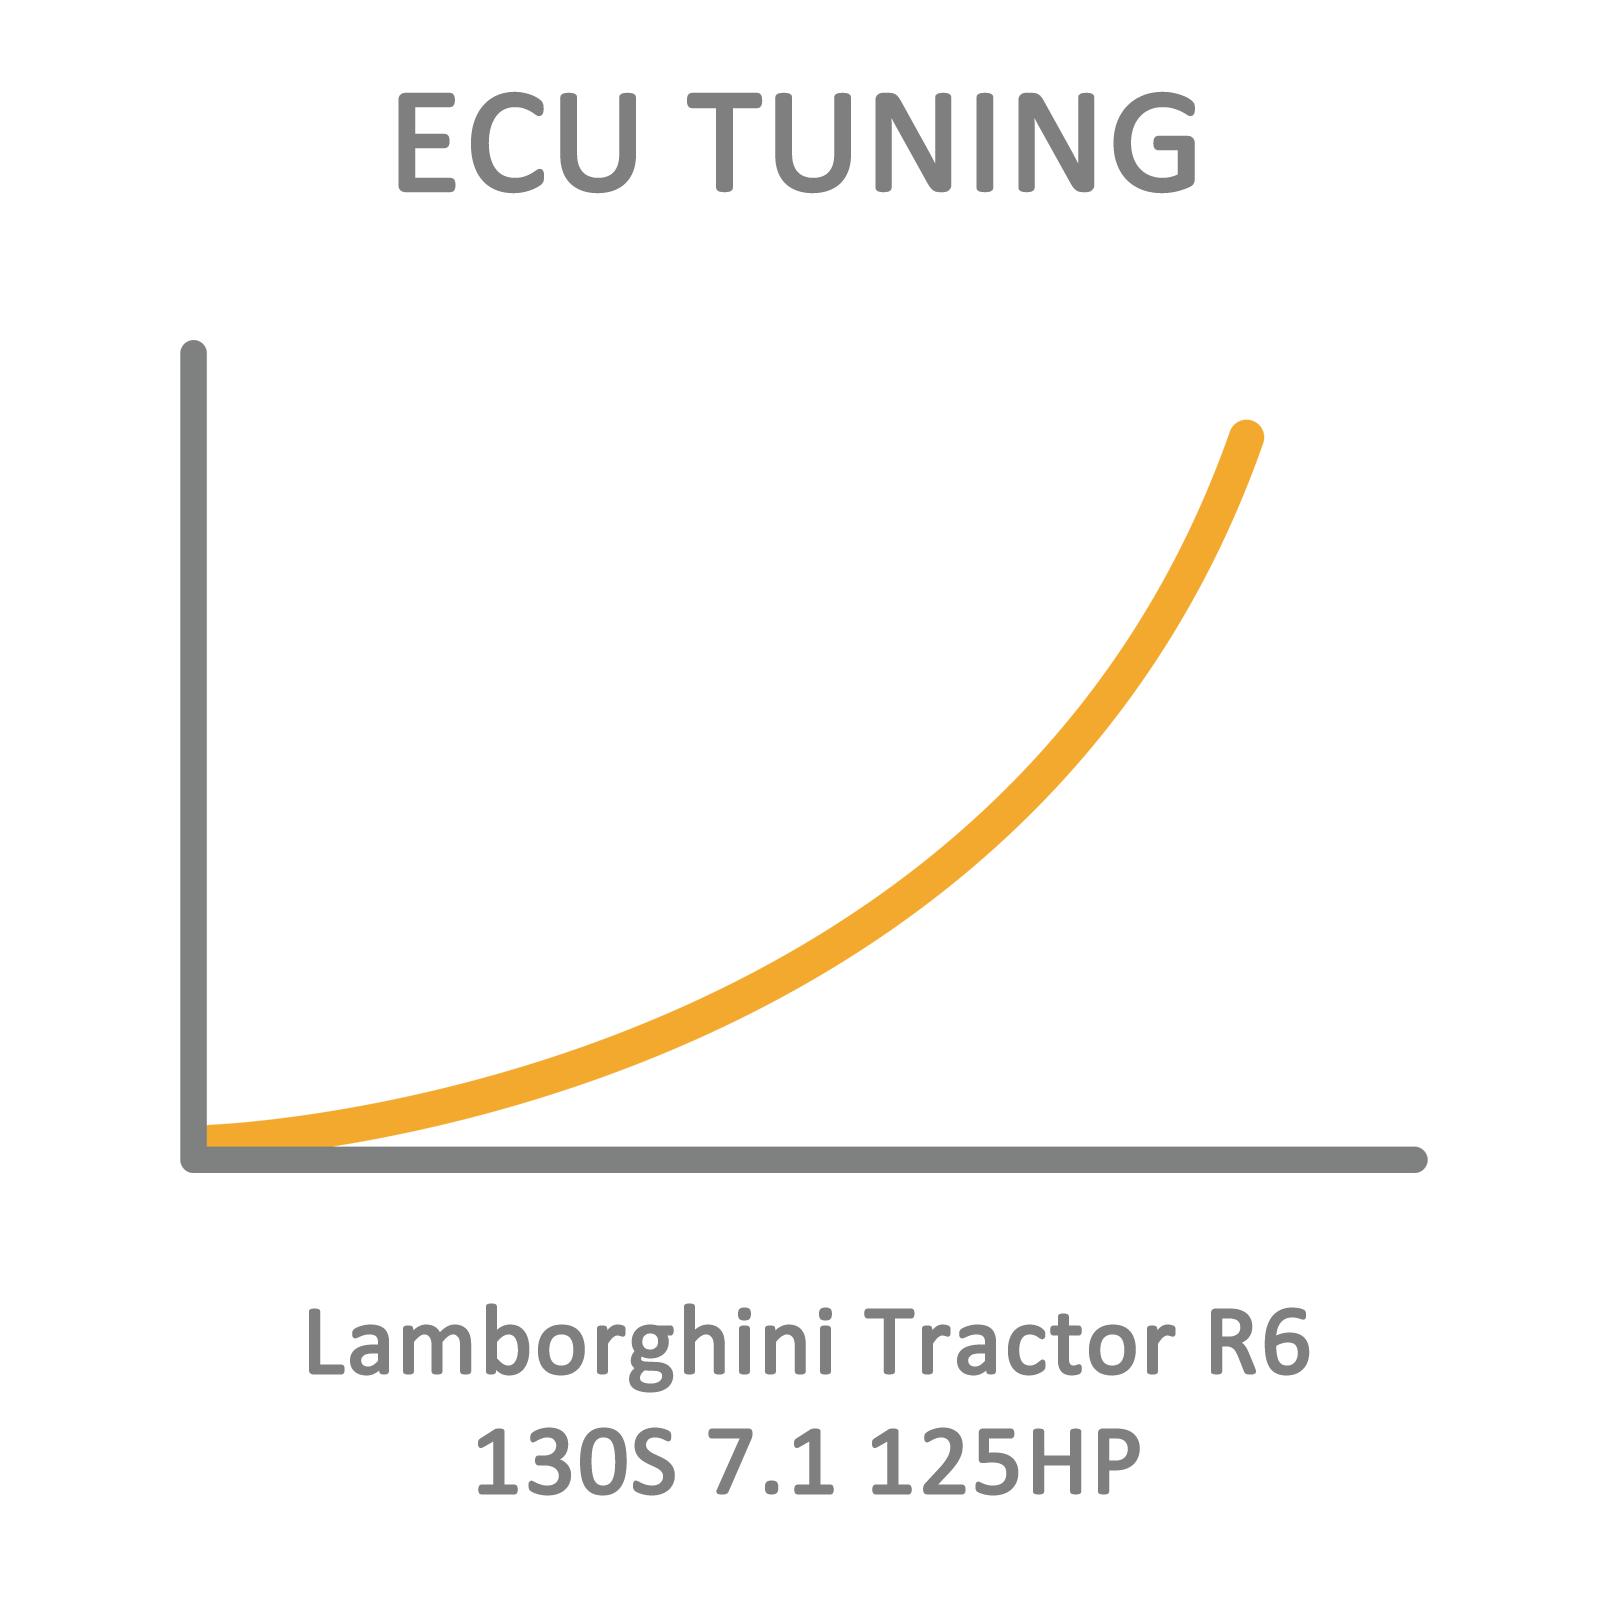 Lamborghini Tractor R6 130S 7.1 125HP ECU Tuning Remapping